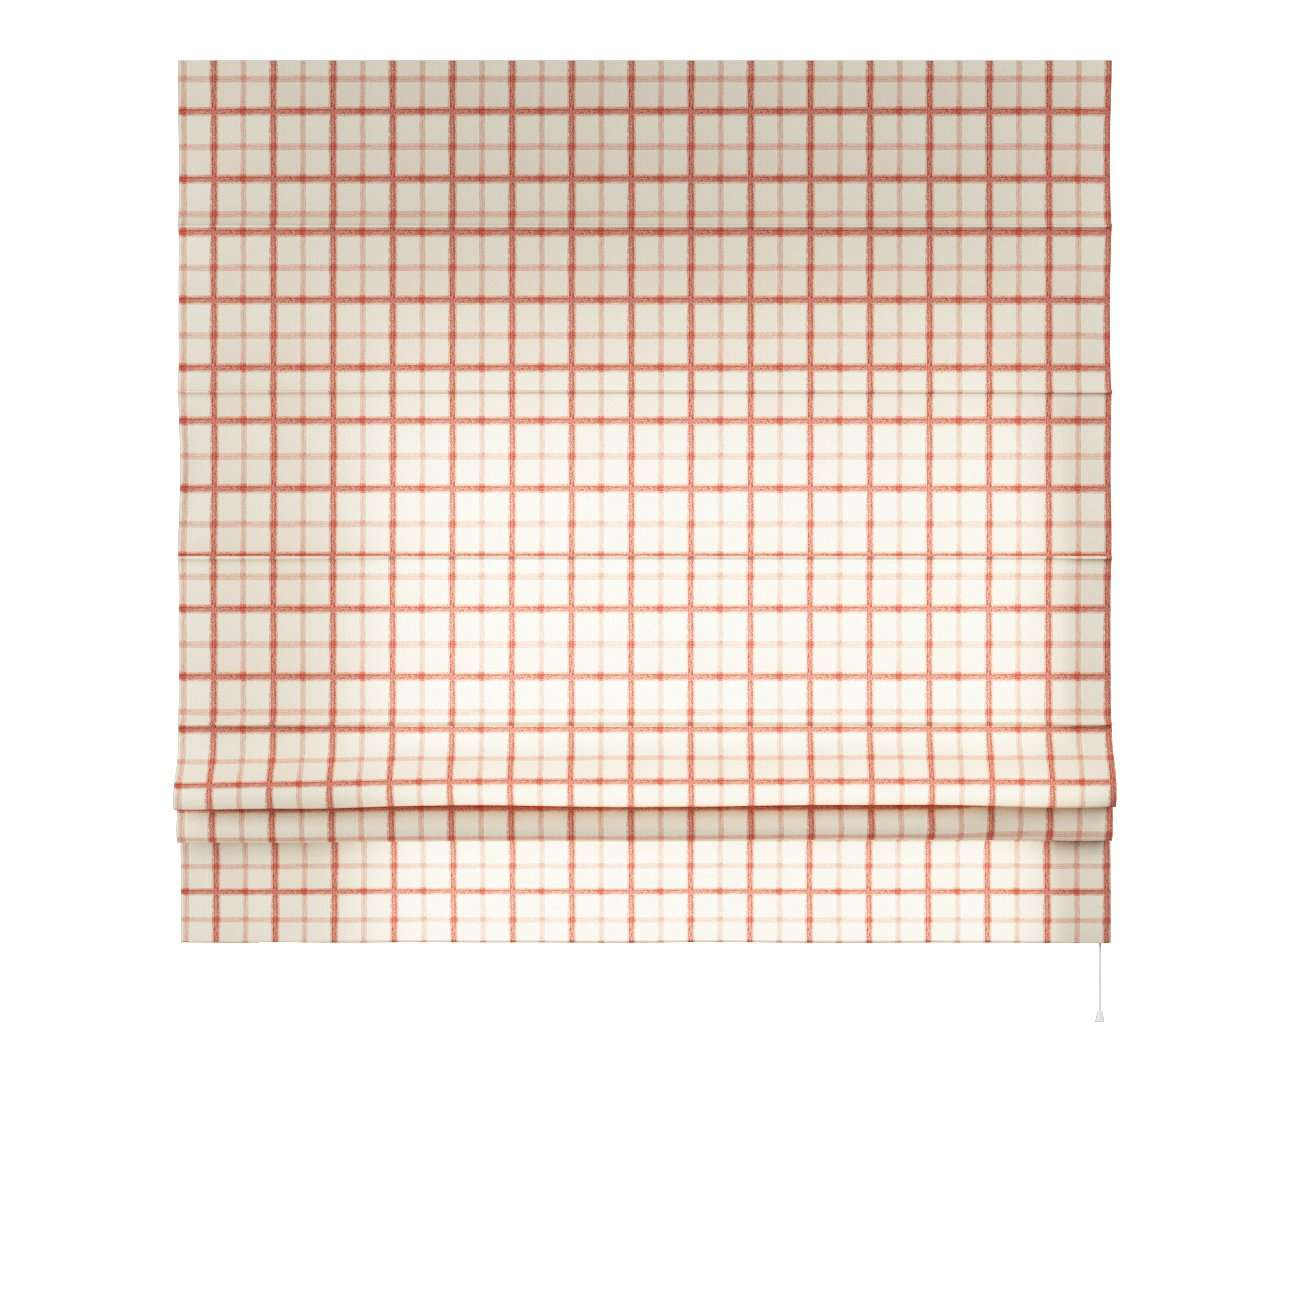 vouwgordijn Padva 80 x 170 cm van de collectie Avinon, Stof: 131-15